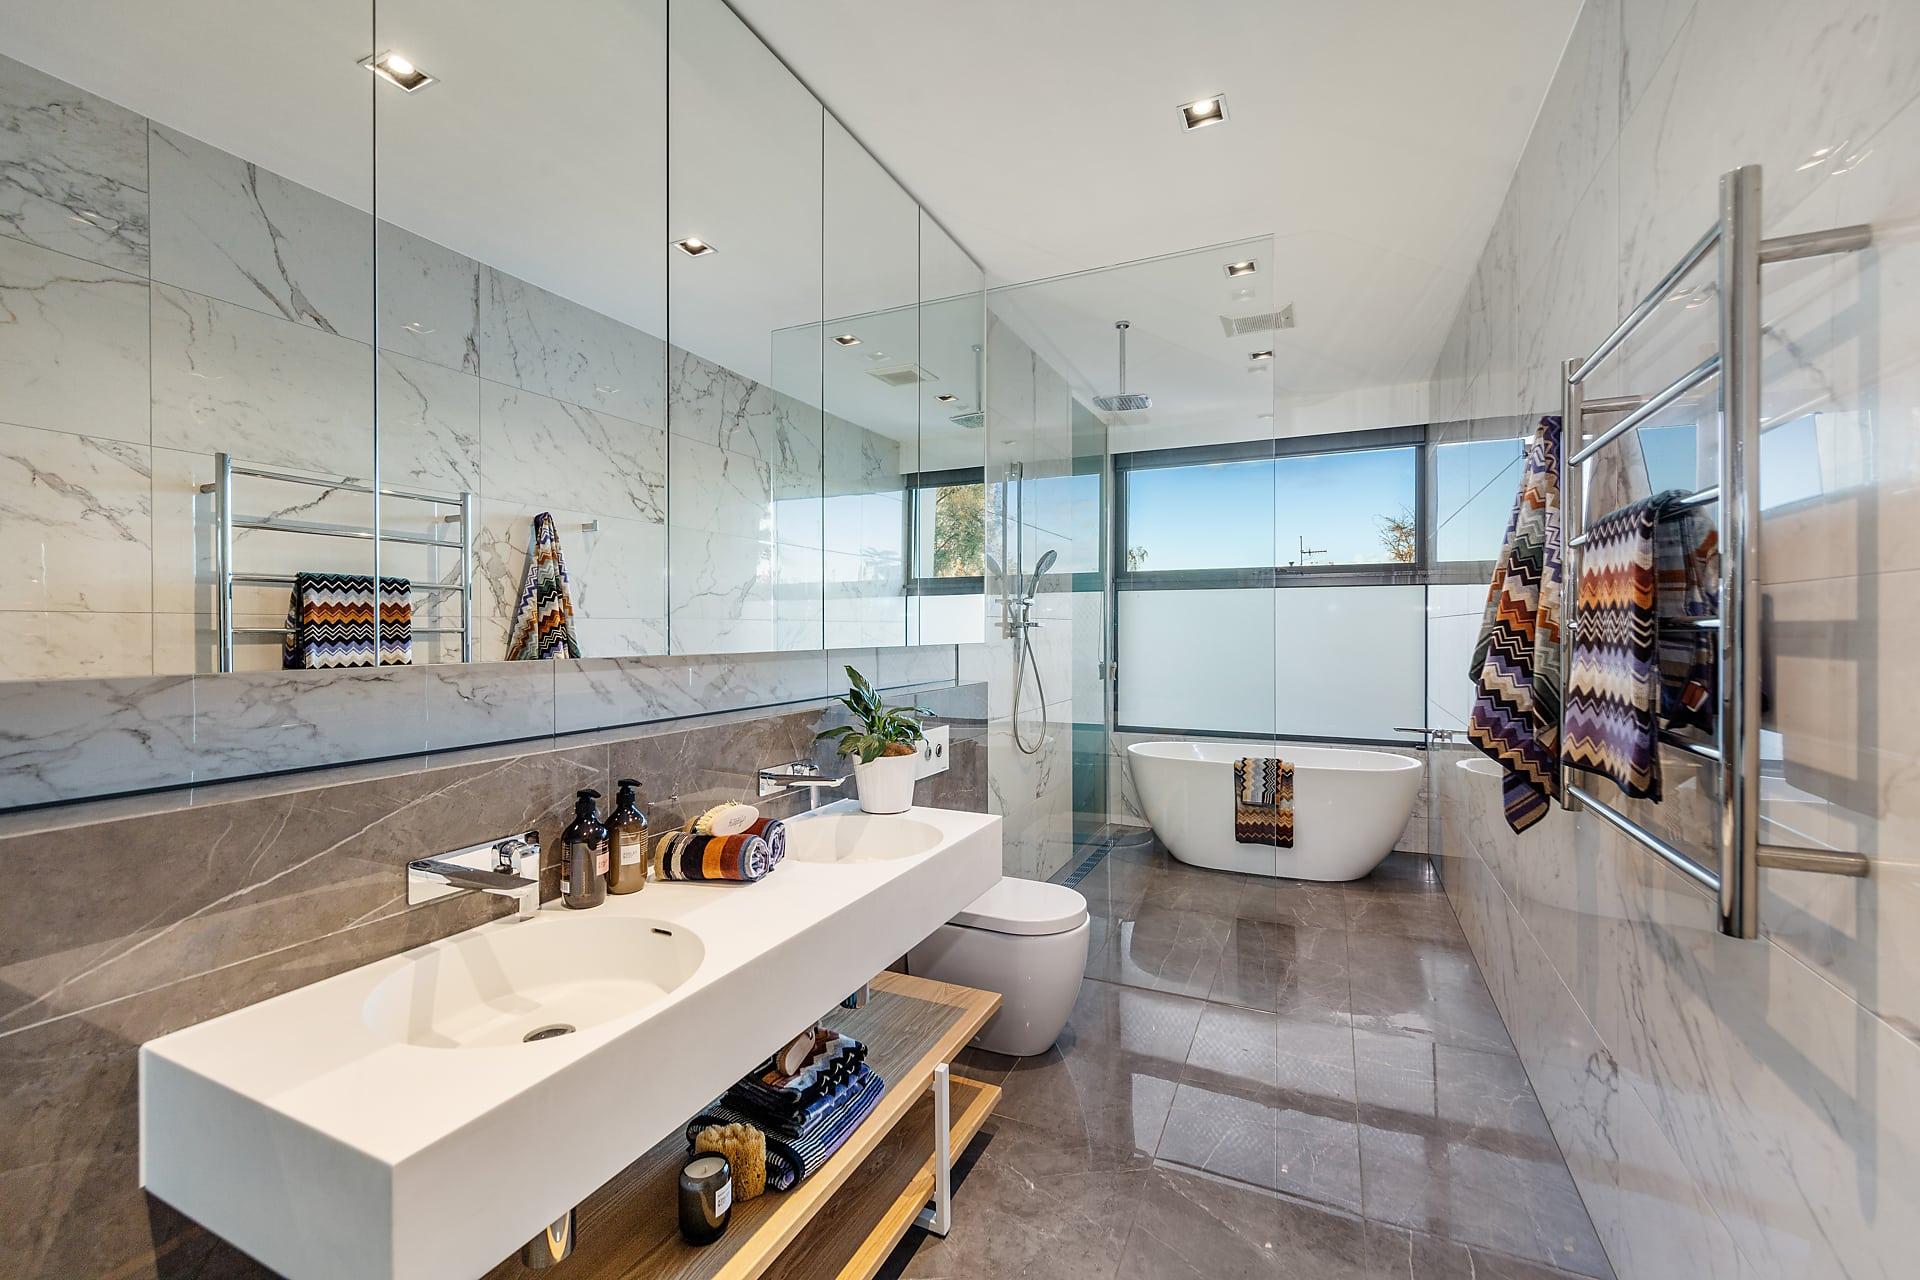 bathroom washing basin made of ceramic